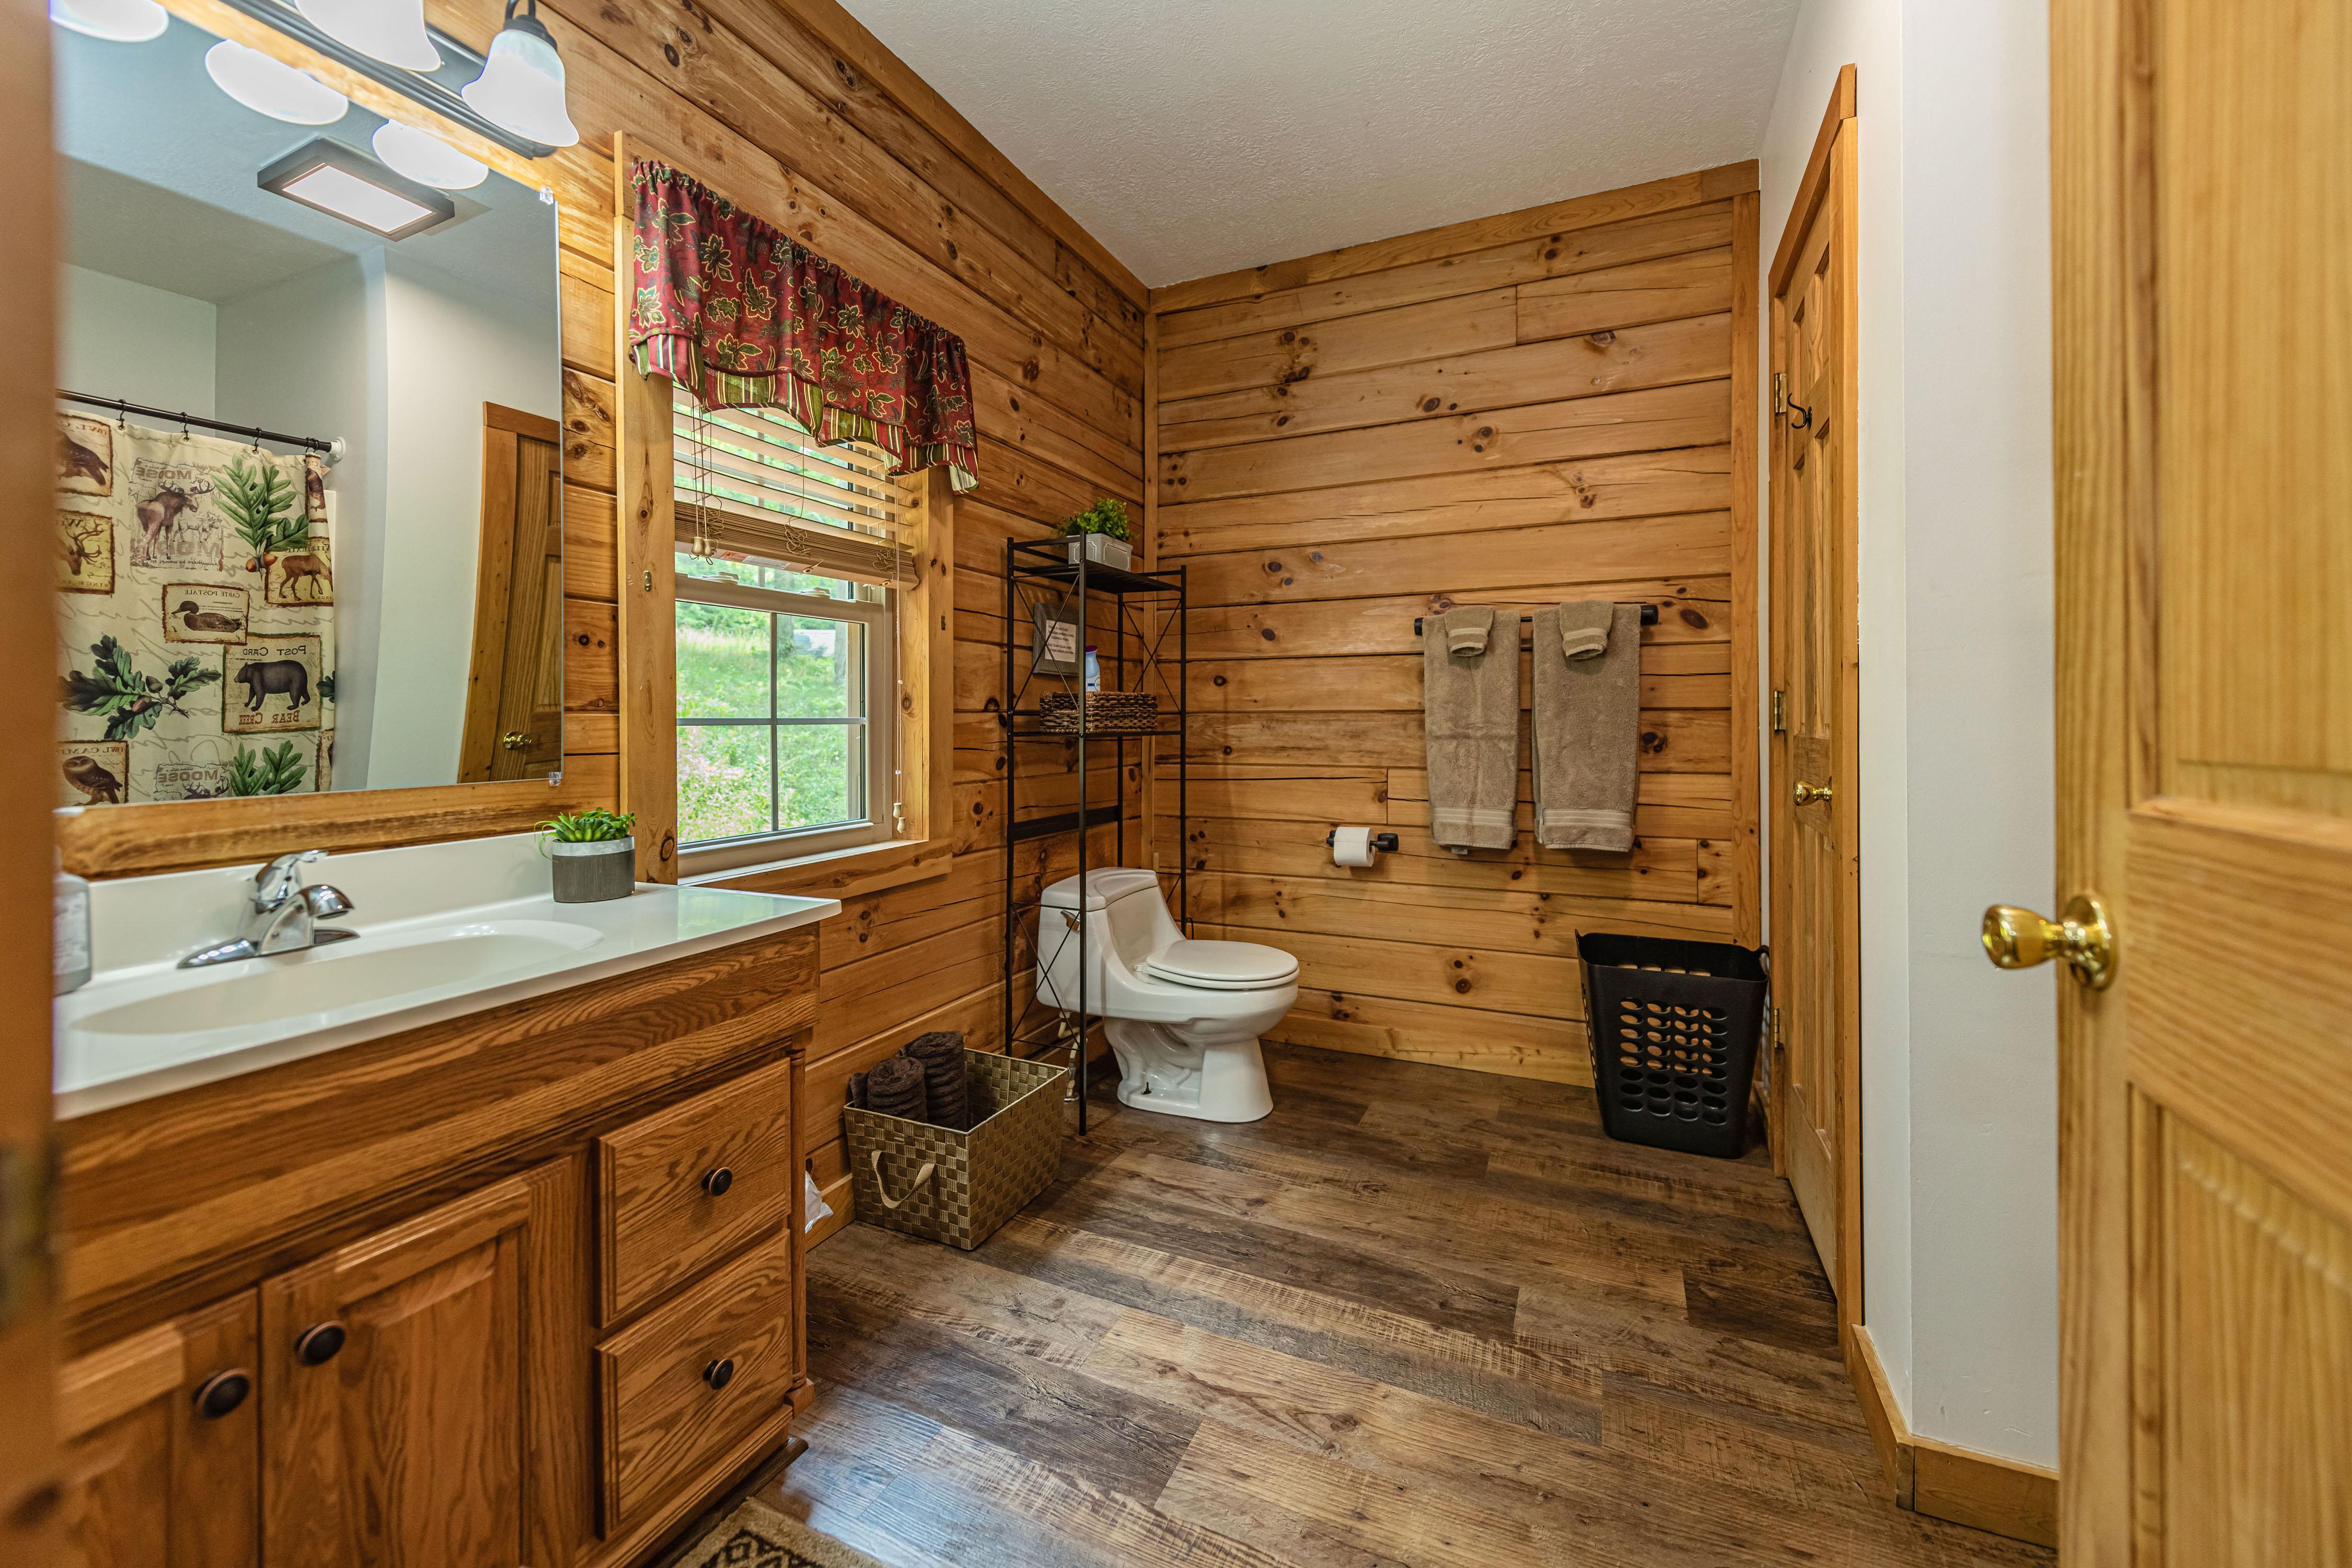 Photo 2006_11582.jpg - Briarwood Bathroom